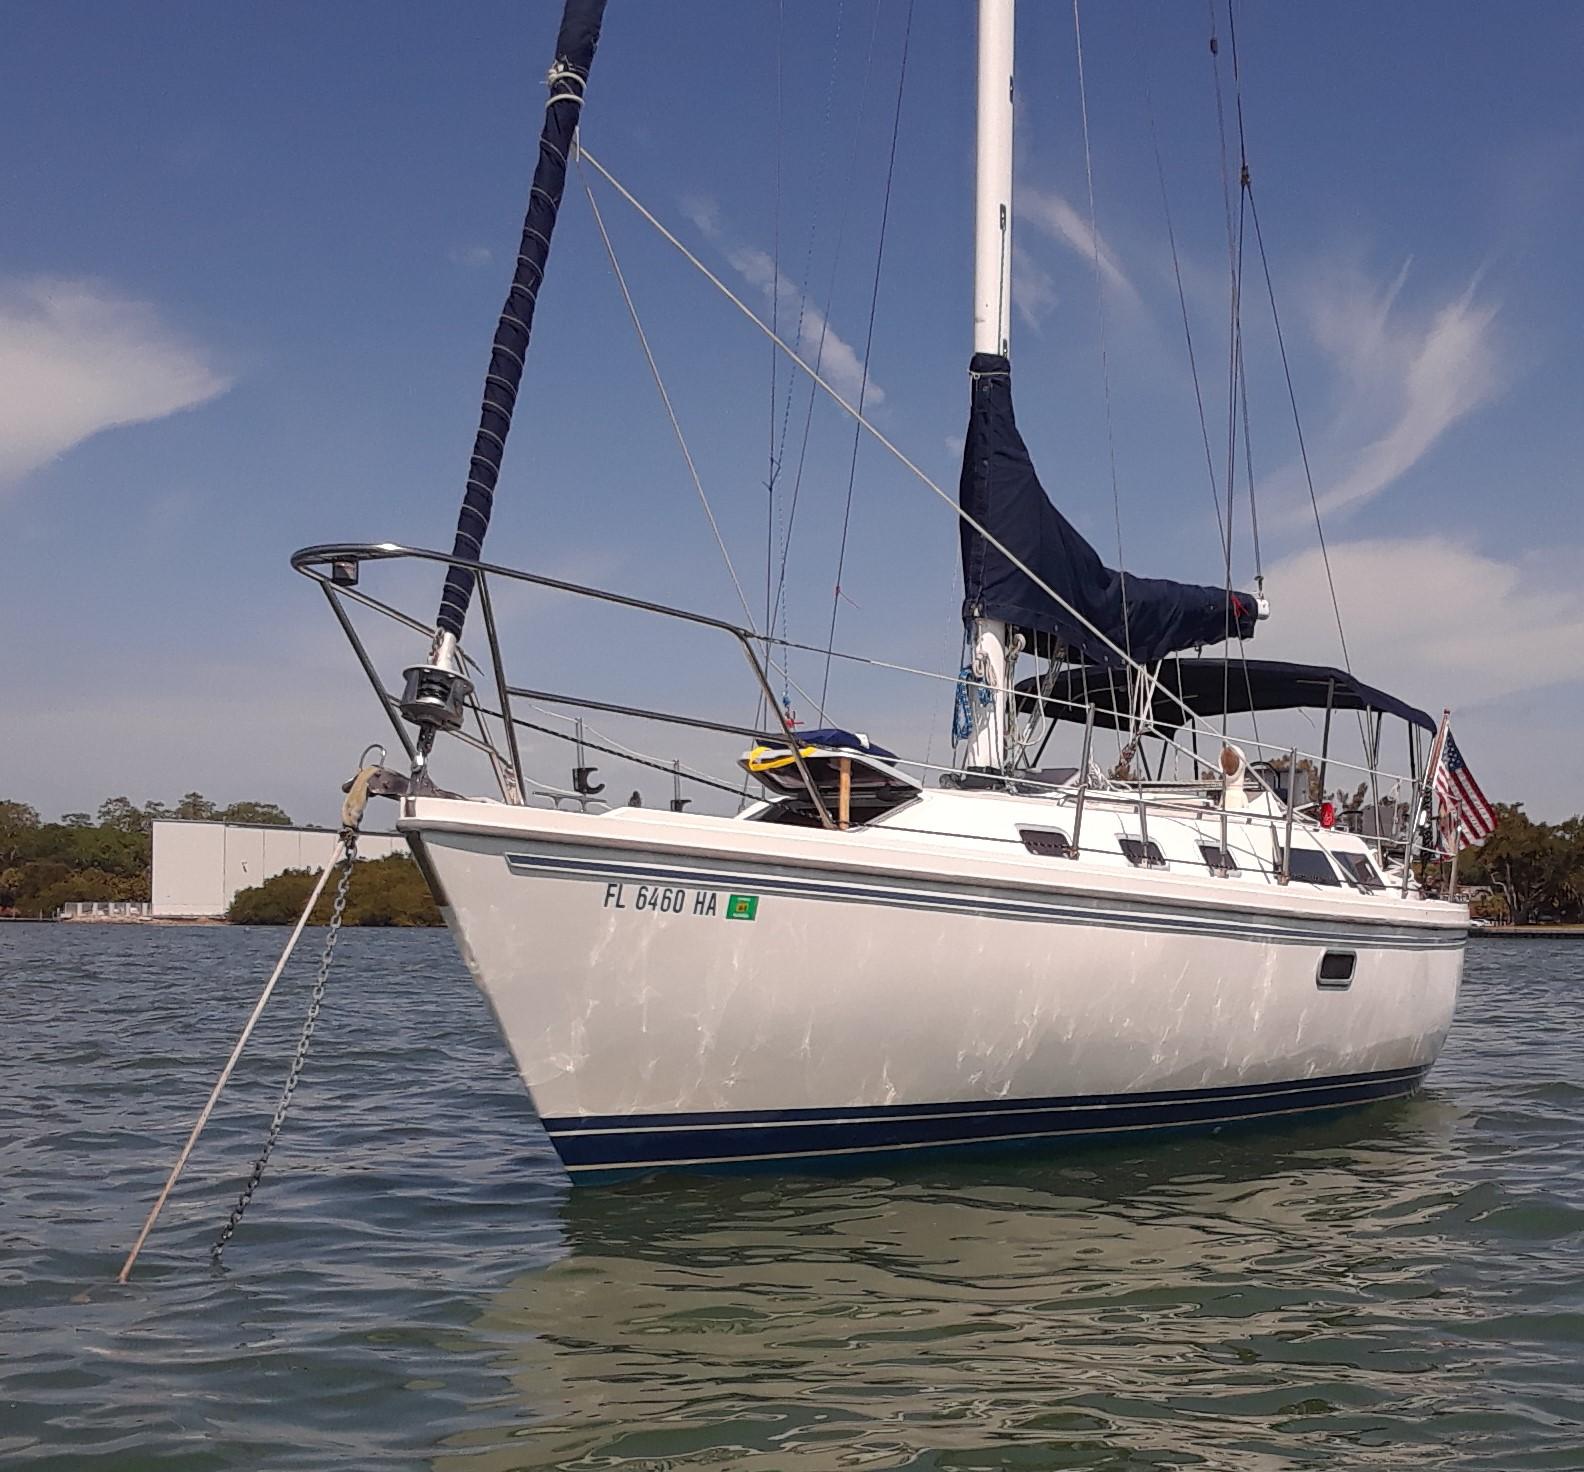 Capt. Rick's Catalina 34